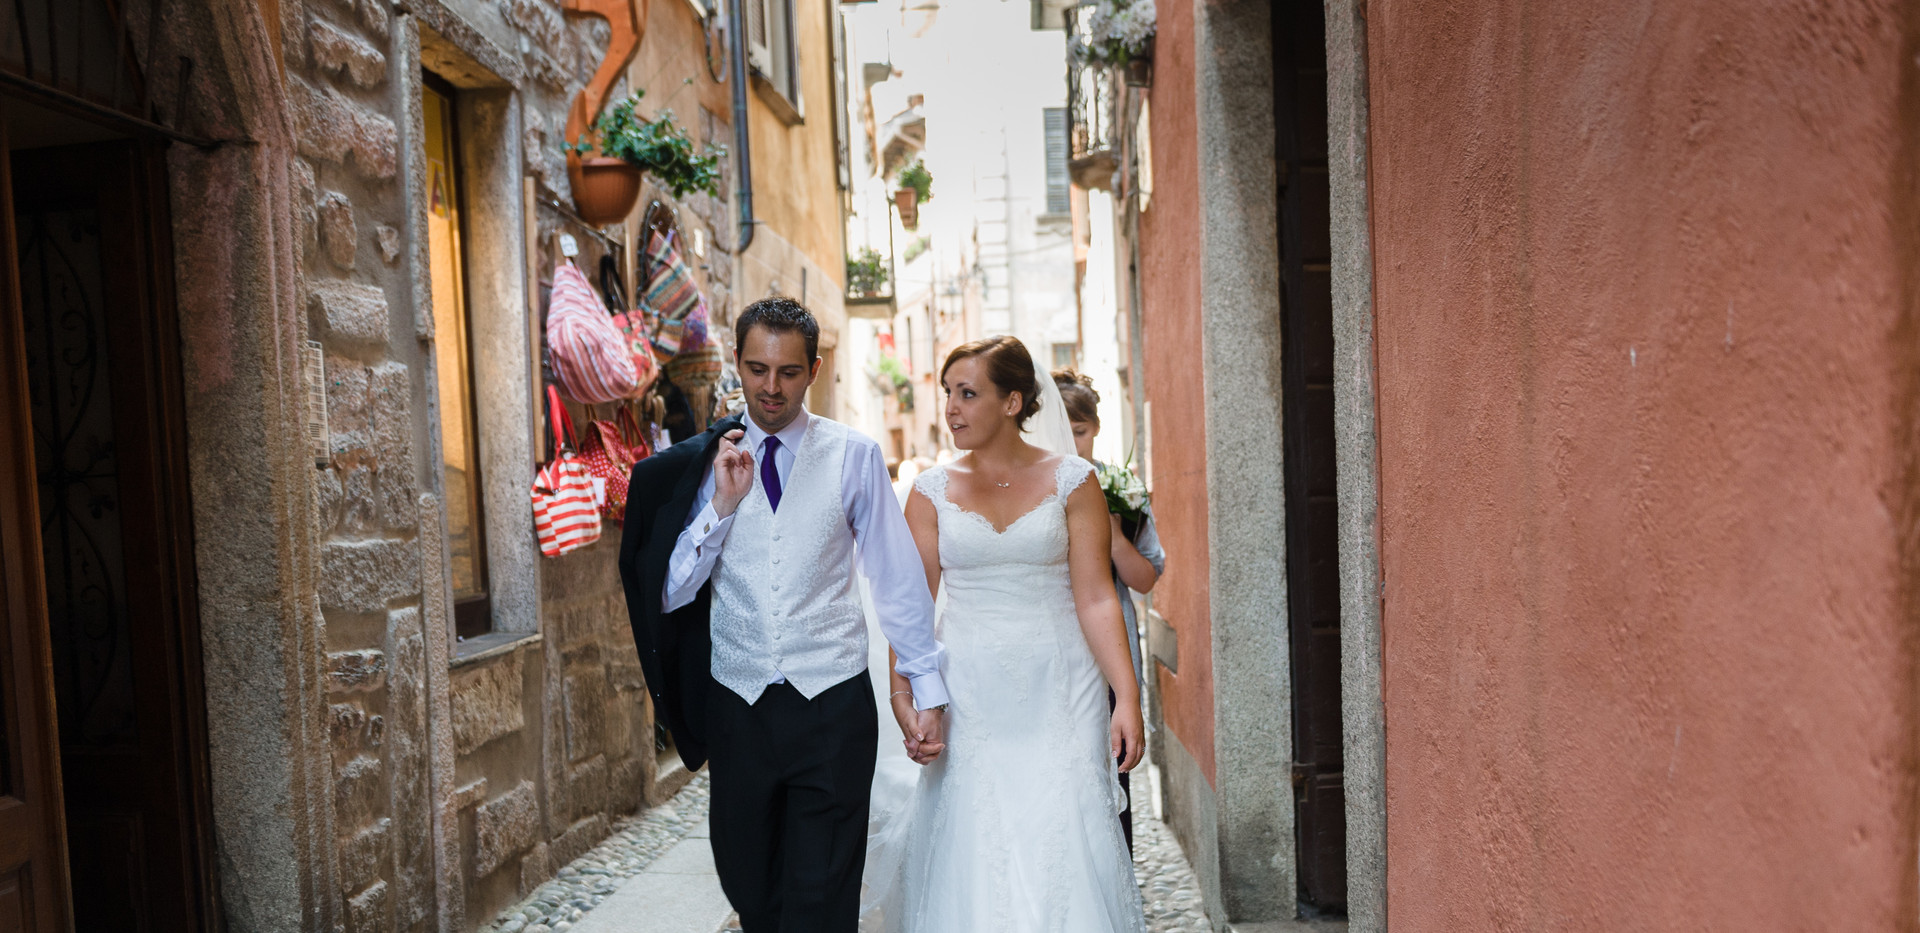 9. Wedding photo shoot on San Giulio Isl